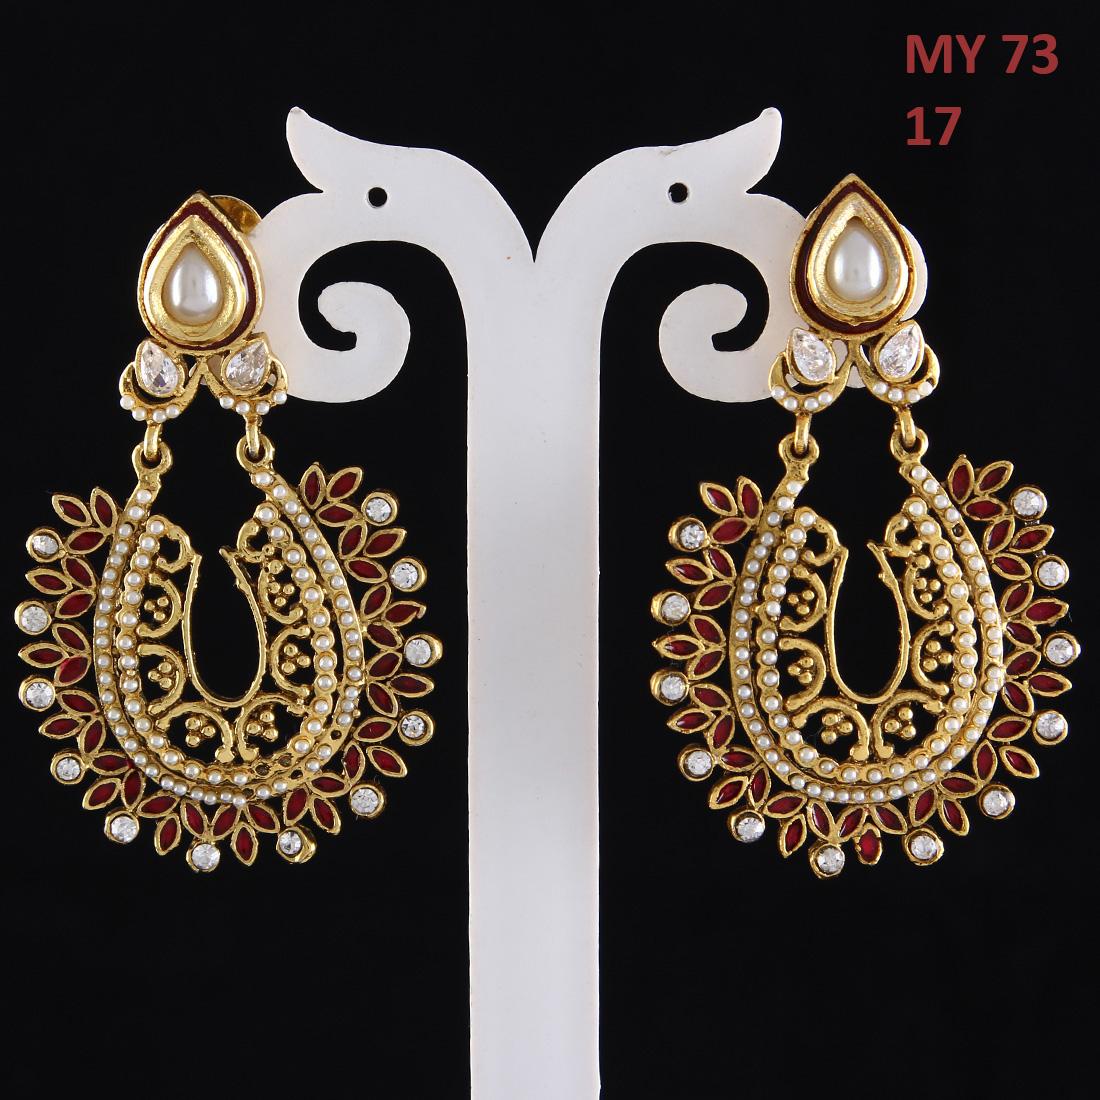 55Carat | Drop Dangle Earrings 18K Gold Plated Emerald, Ruby Emerald, Ruby Beautiful Drop Dangle Earrings 18K Gold Plated Emerald, Ruby for Girlfriend Wife Beautiful